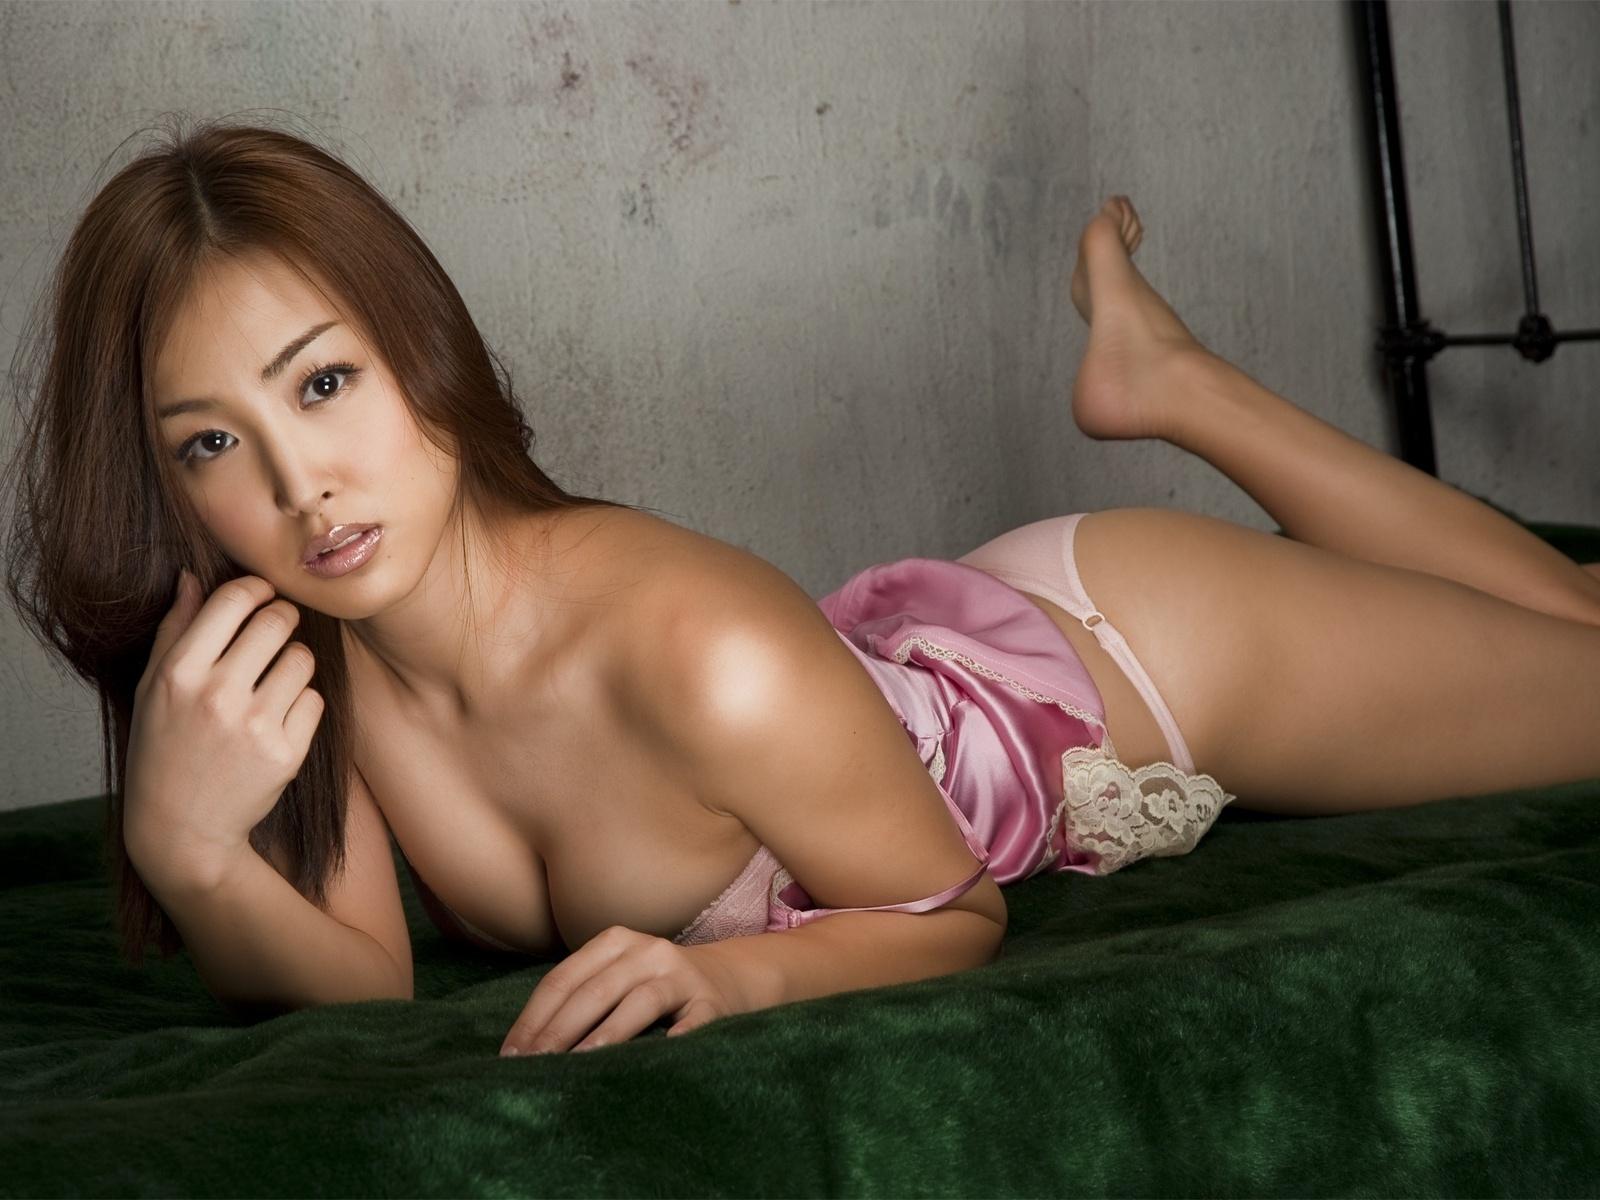 Фото секси азиатские девушки, Порно фото азиаток, Фотографии секса с азиатками 2 фотография